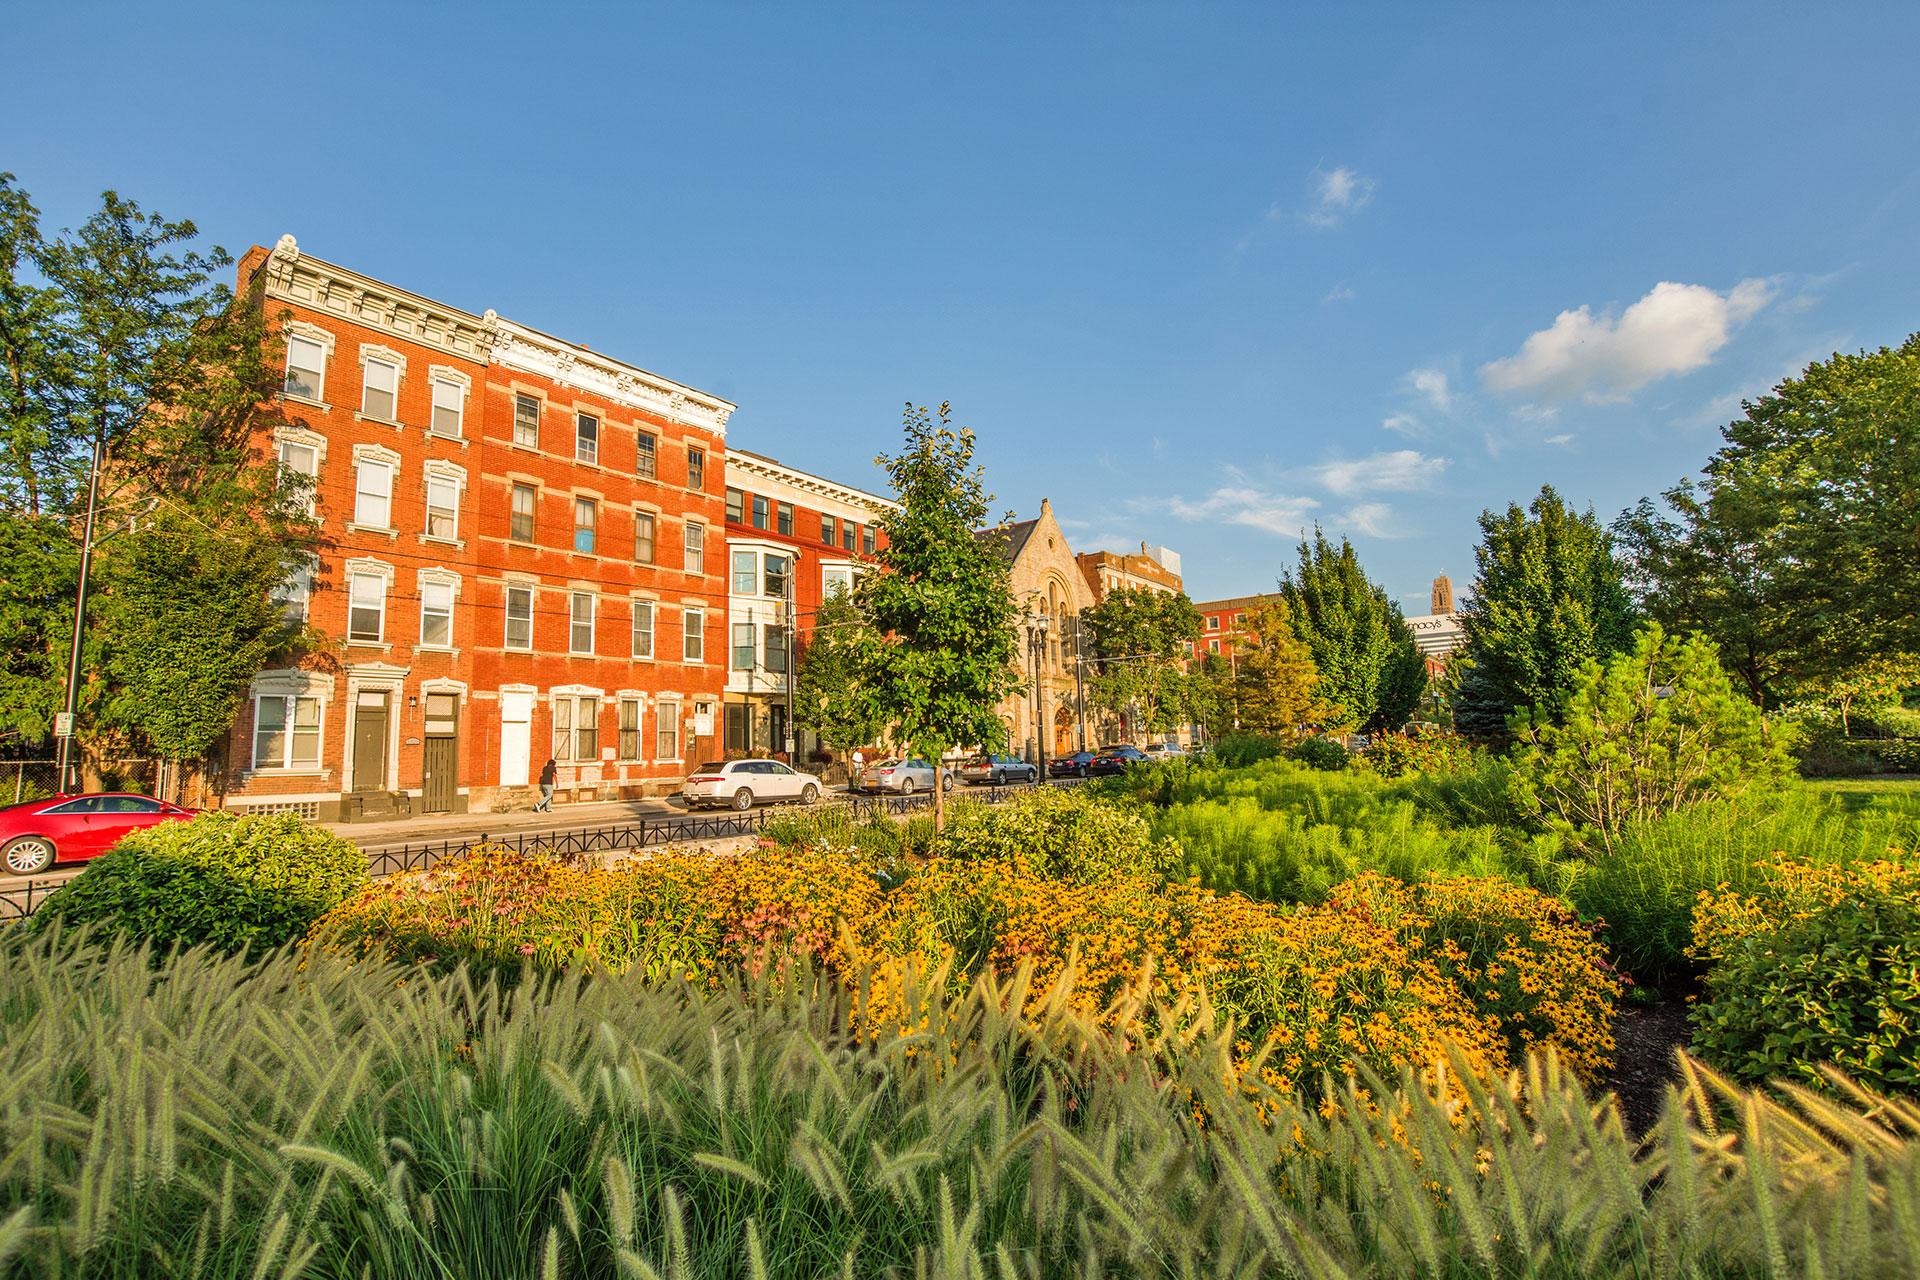 Washington Park in Cincinnati; Courtesy of Christian Hinkle/Shutterstock.com